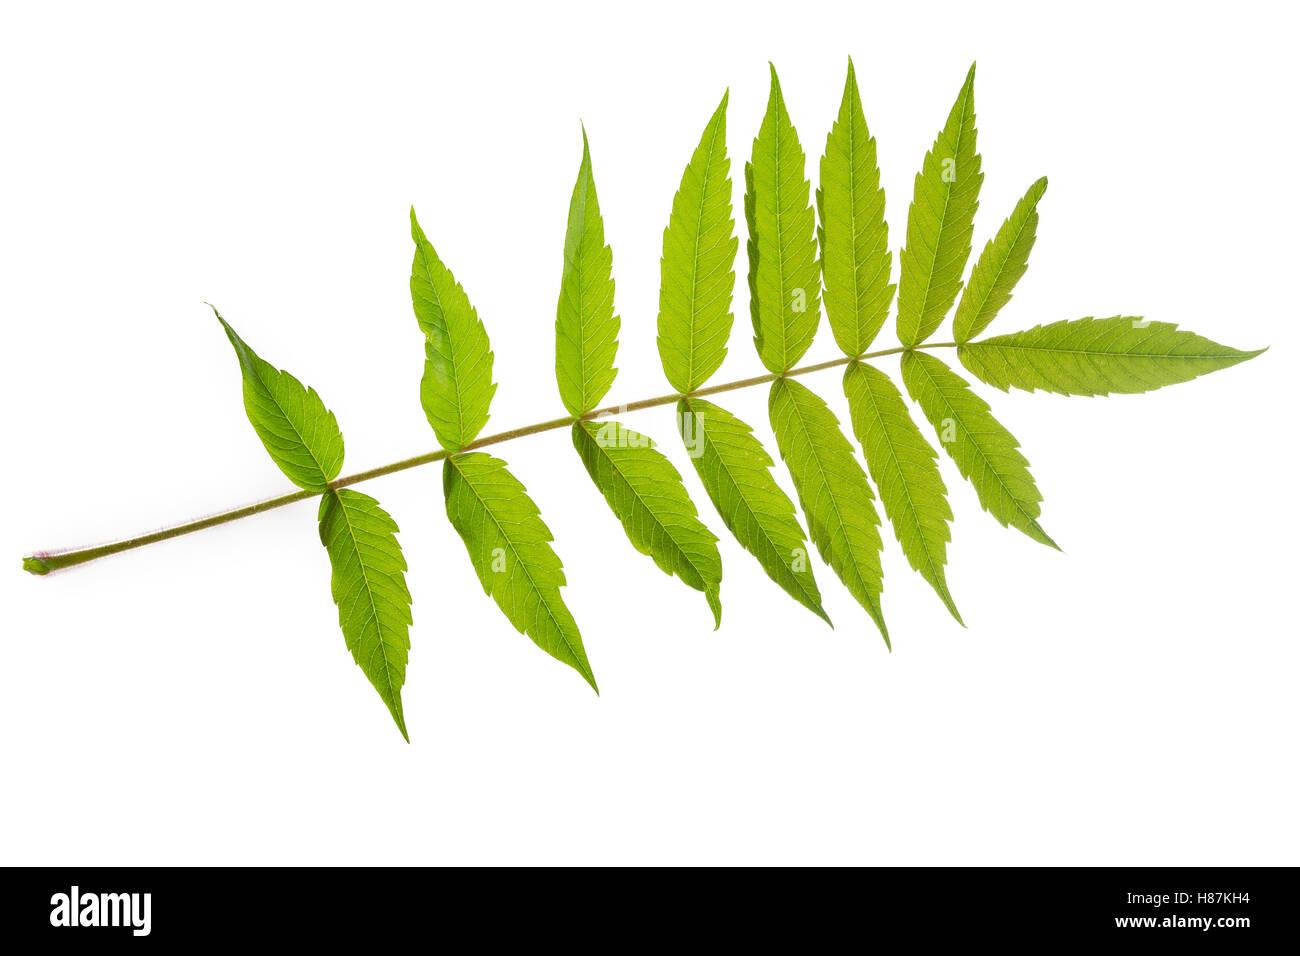 Essigbaum, Essig-Baum, Kolbensumach, Kolben-Sumach, Rhus typhina, Rhus hirta, Stag´s Horn Sumach, Le sumac - Stock Image